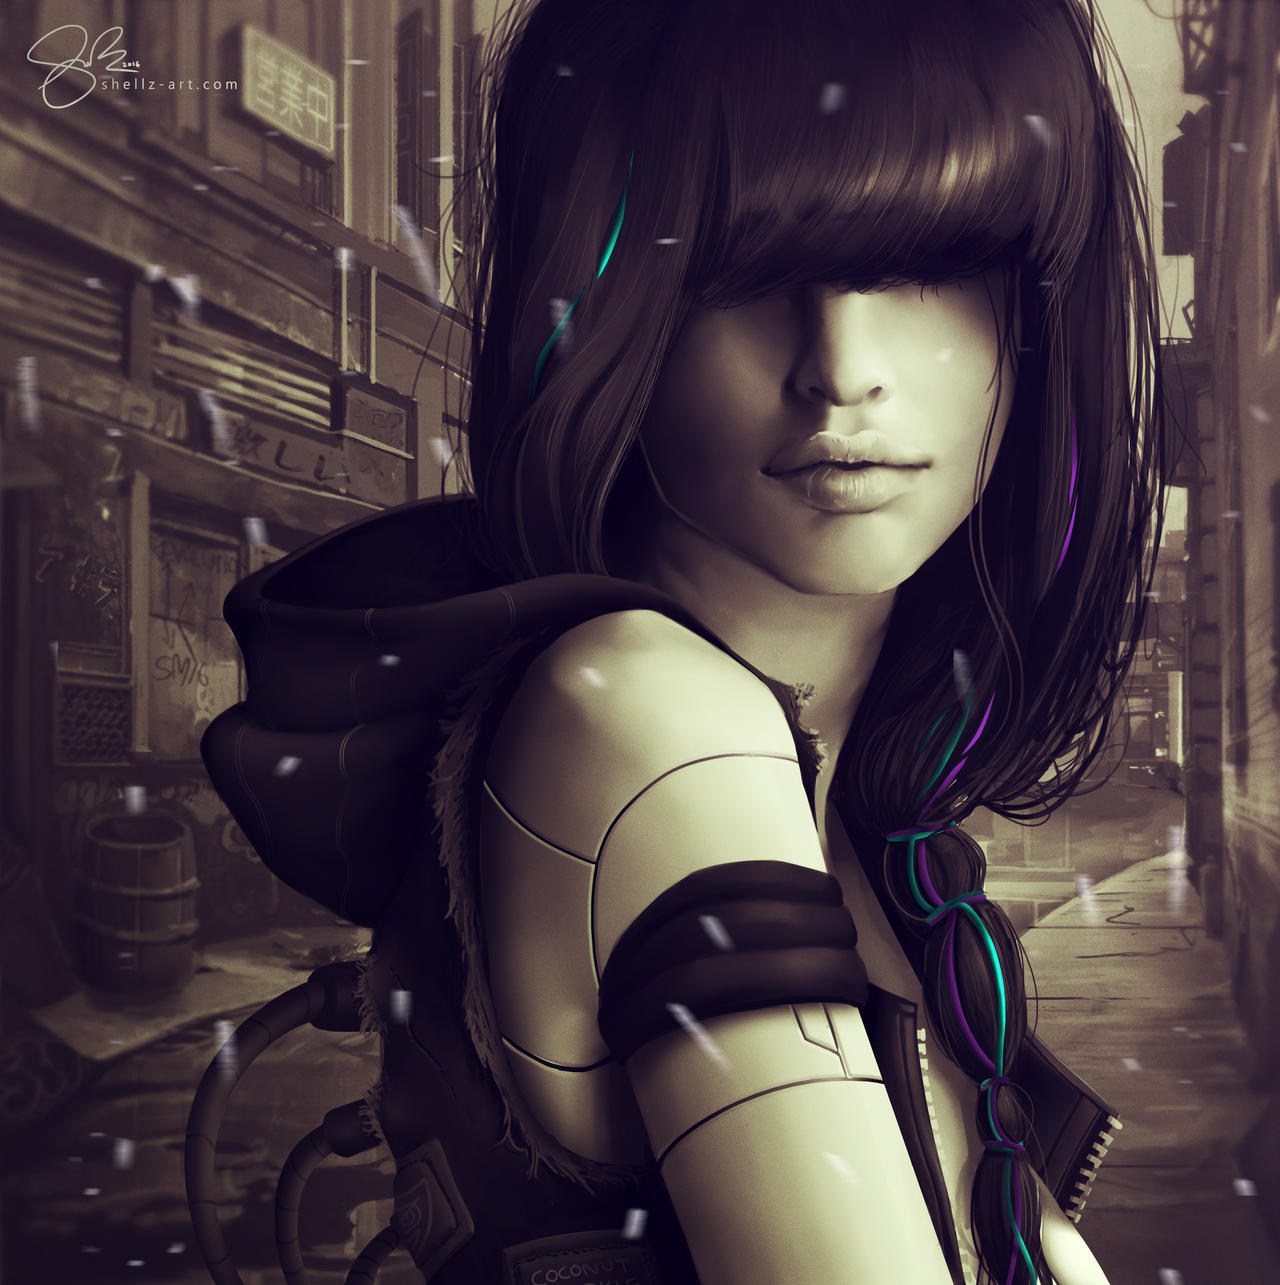 Youtube | Dreamcatcher v2 by shellz-art